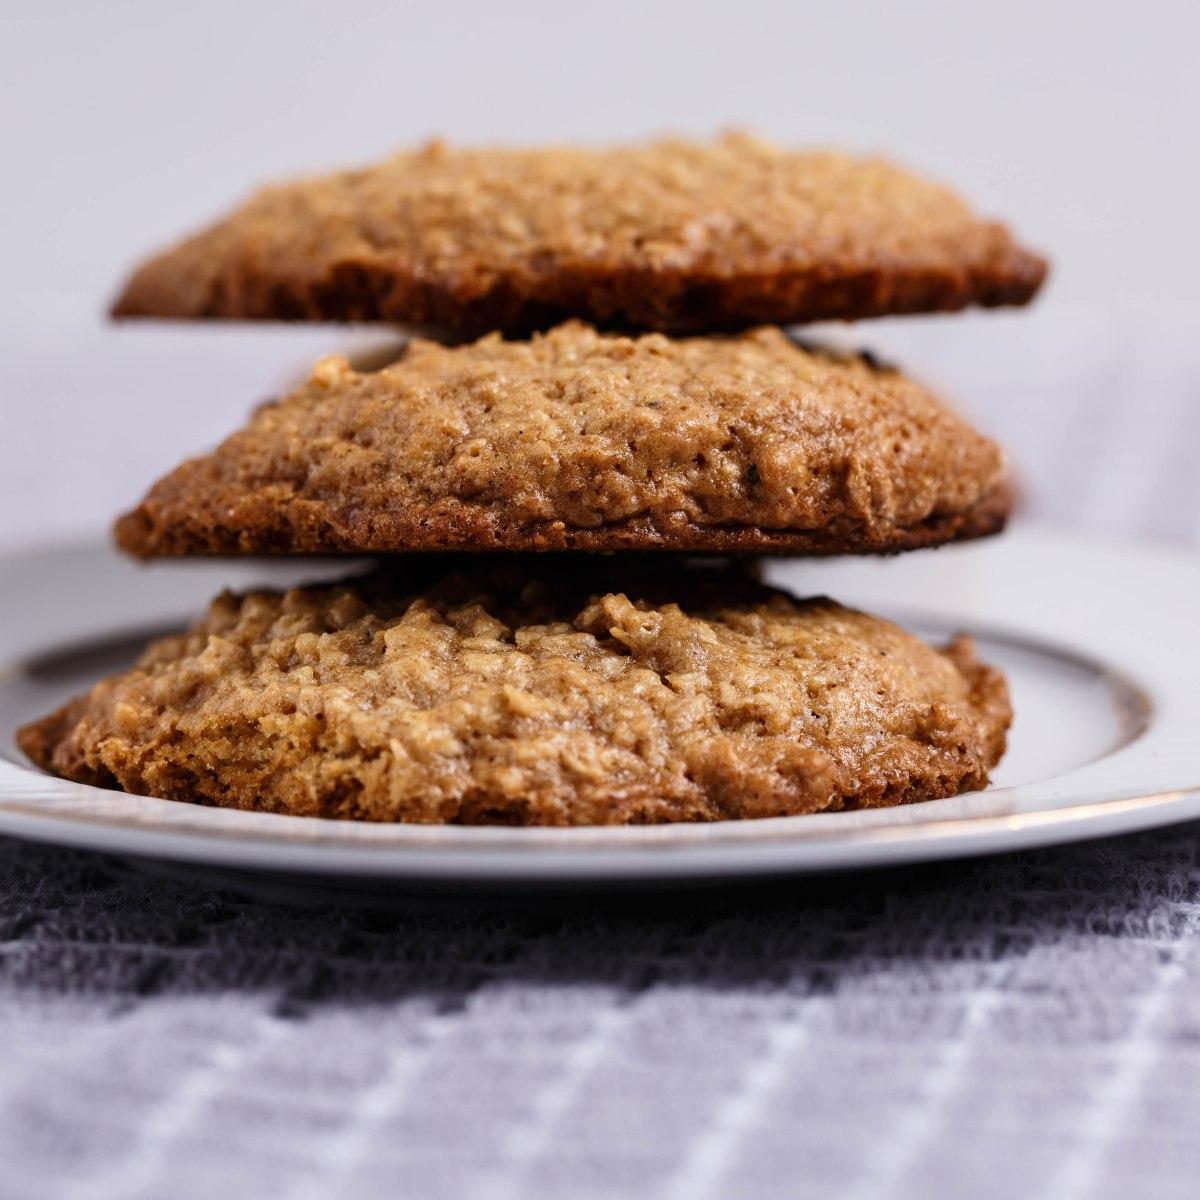 Jamaican Oatmeal Cookies